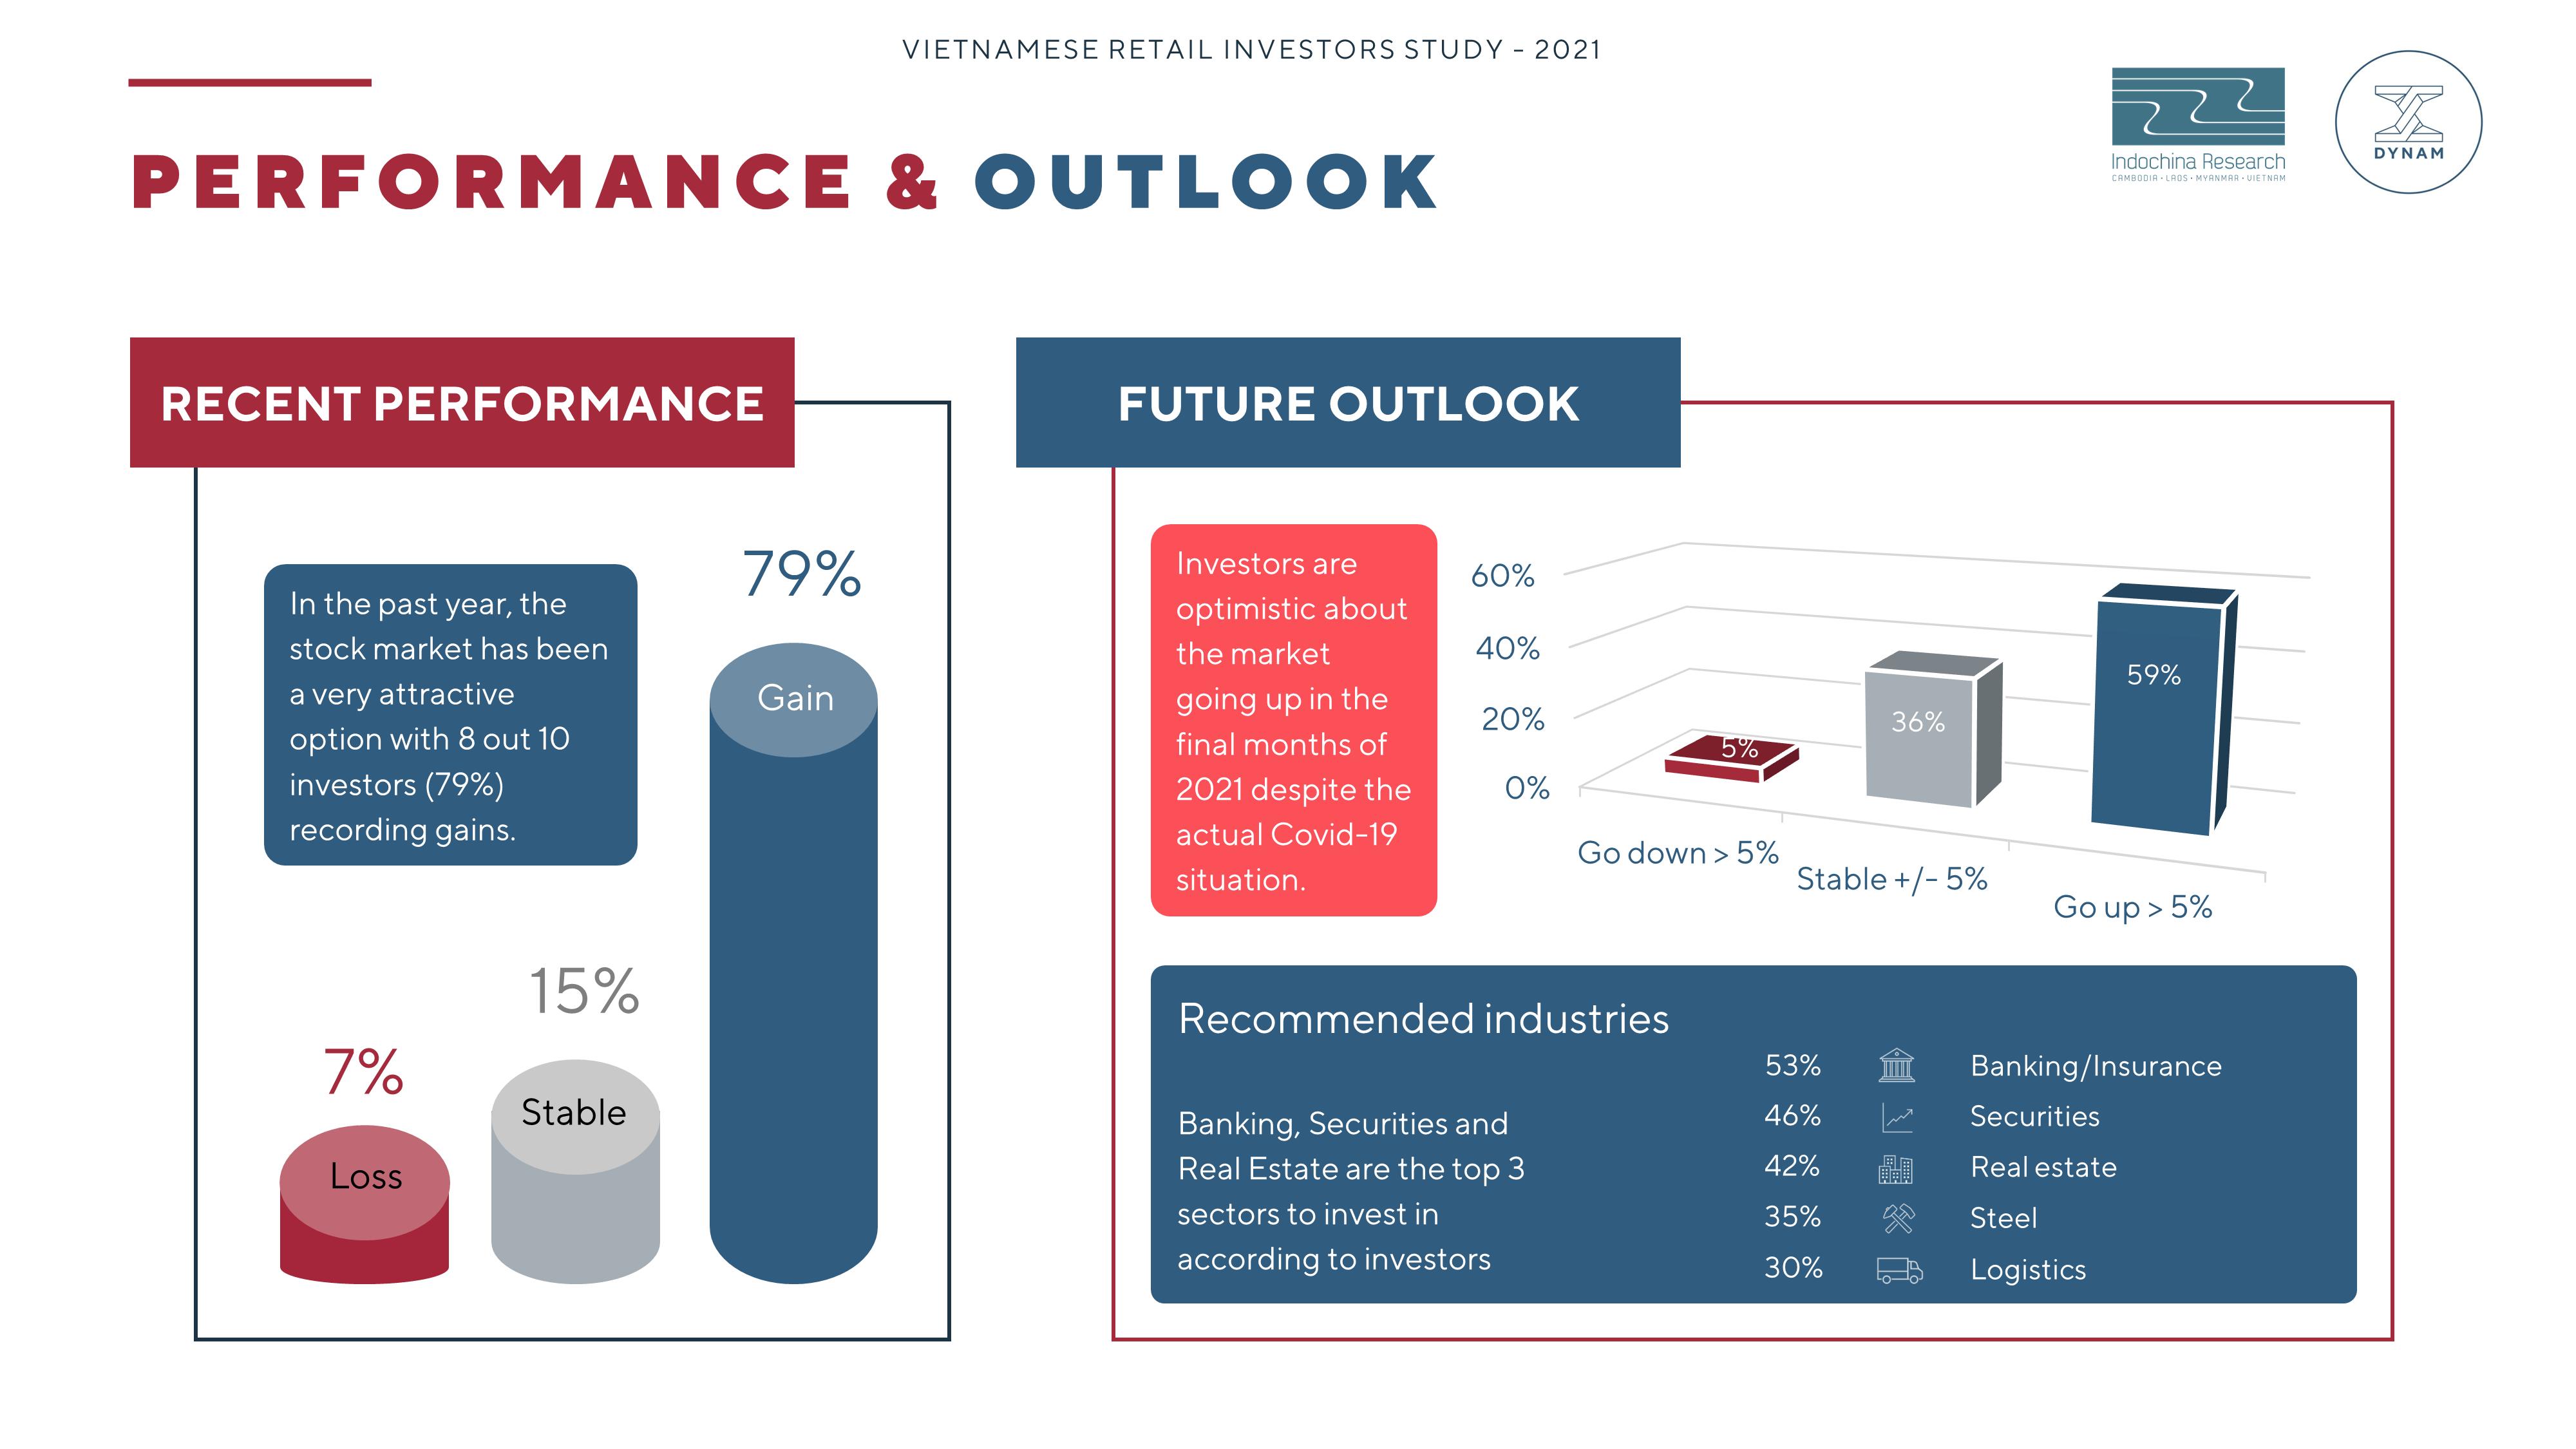 Investors - Outlook